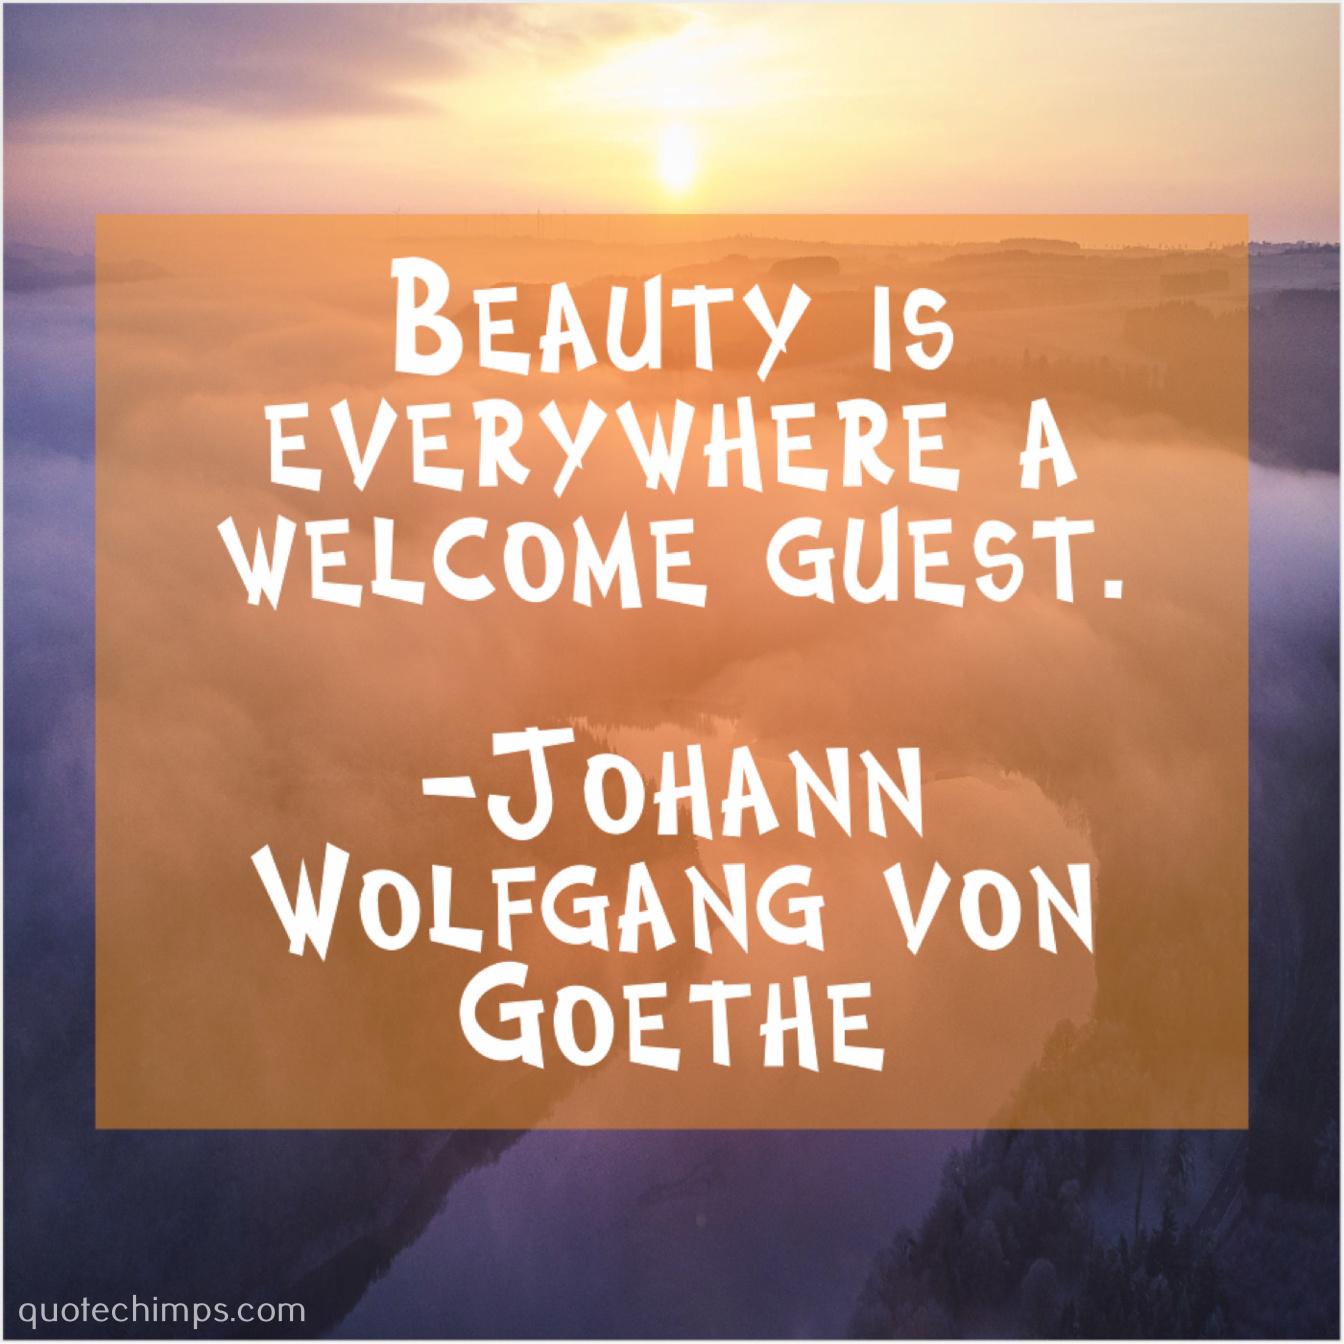 Johann Wolfgang Von Goethe Beauty Is Everywhere A Welcome